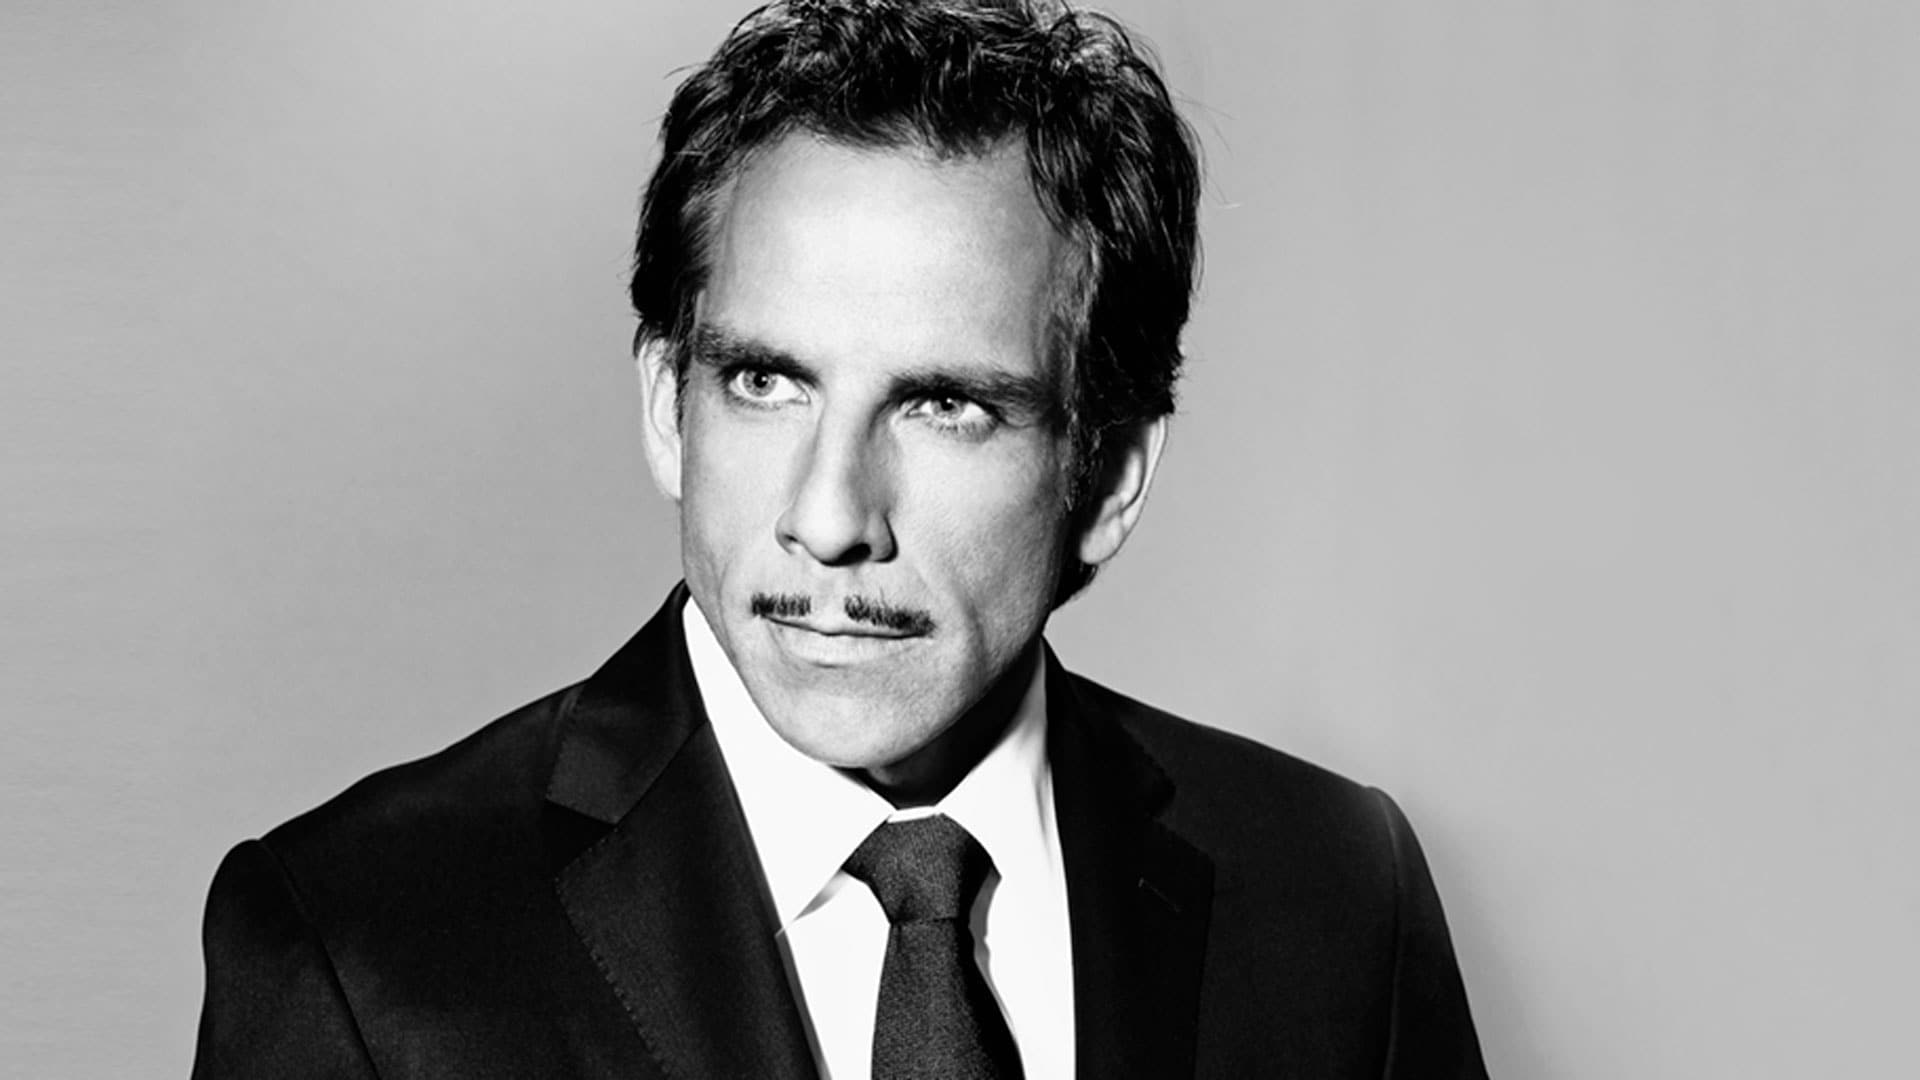 Ben Stiller: October 8, 2011